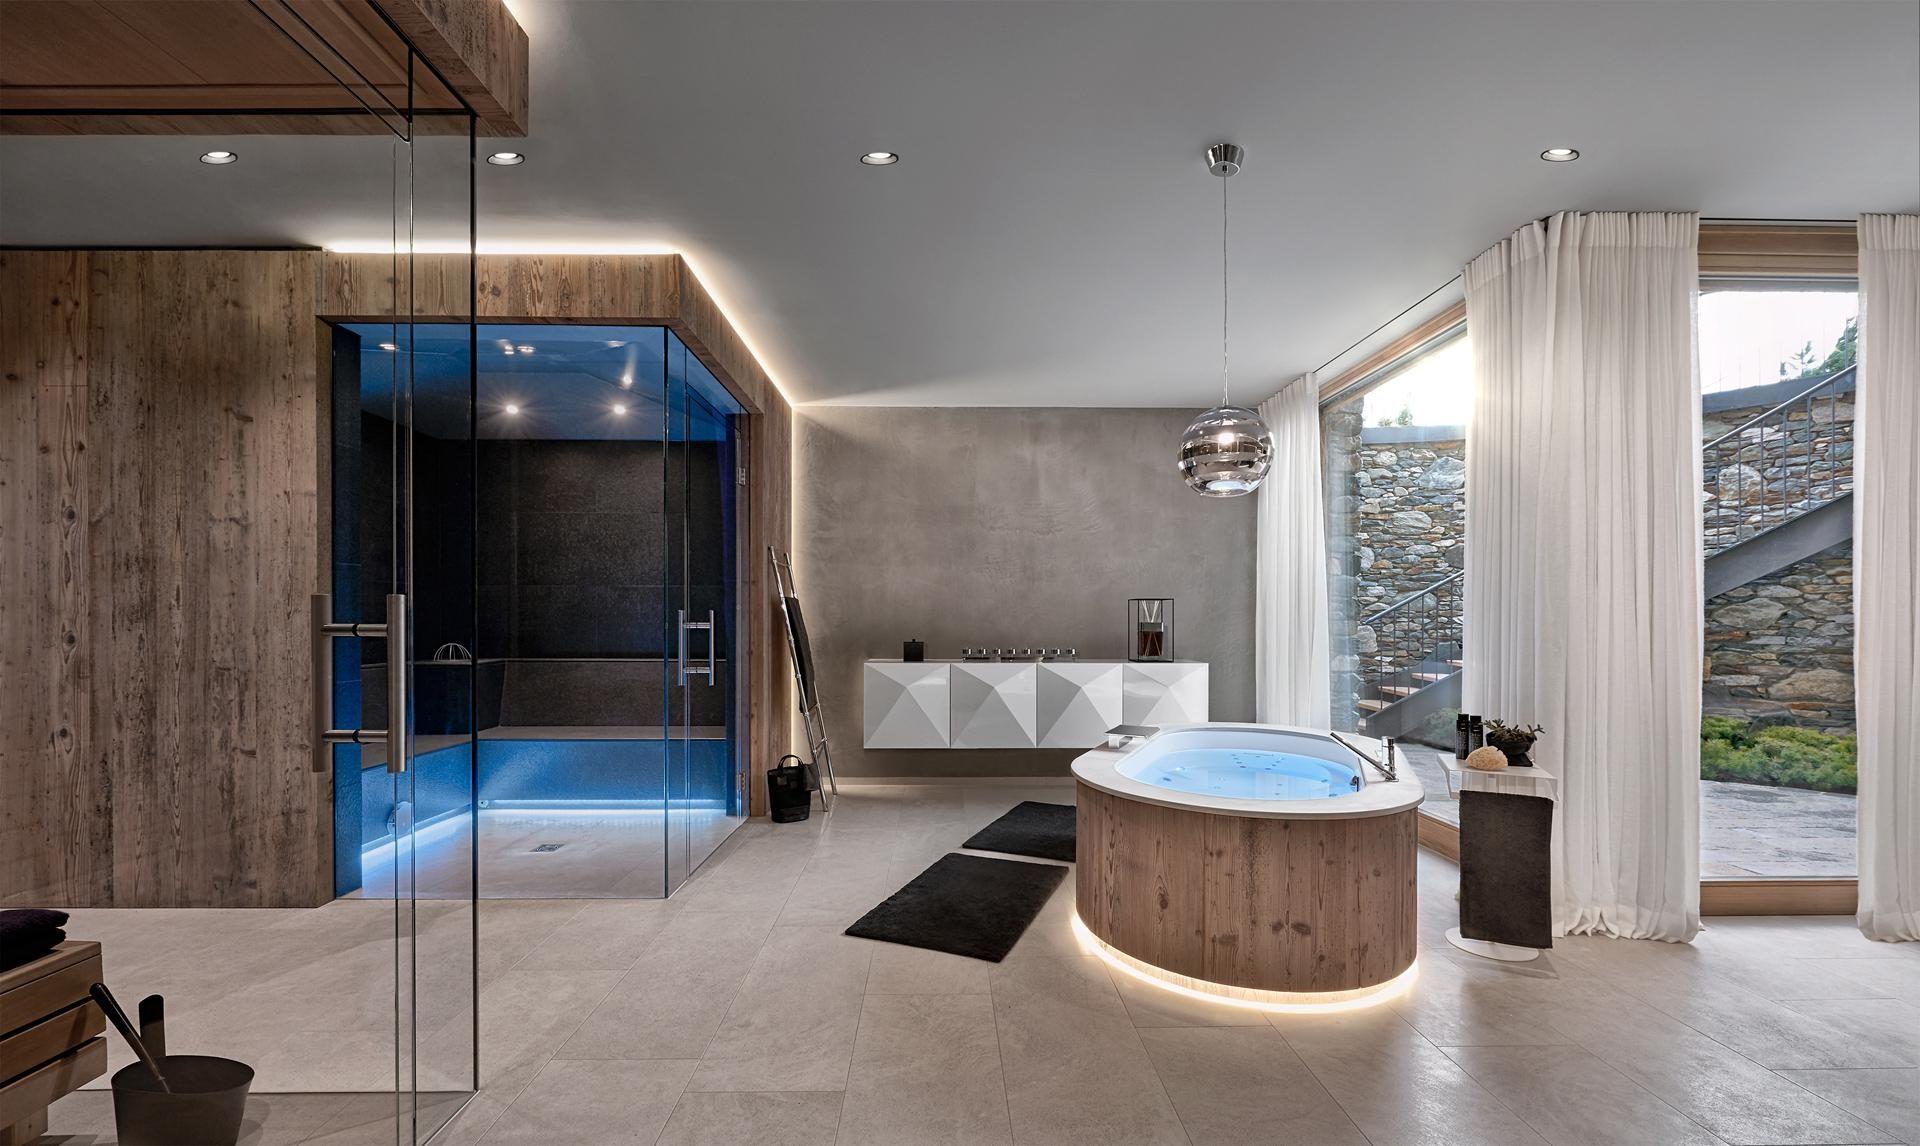 Gasteiger Bad Kitzbuhel Wellness Sauna Dampfbad Schwimmbad Whirlpool Luxury Bathroom Home Spa Room Bathroom Model